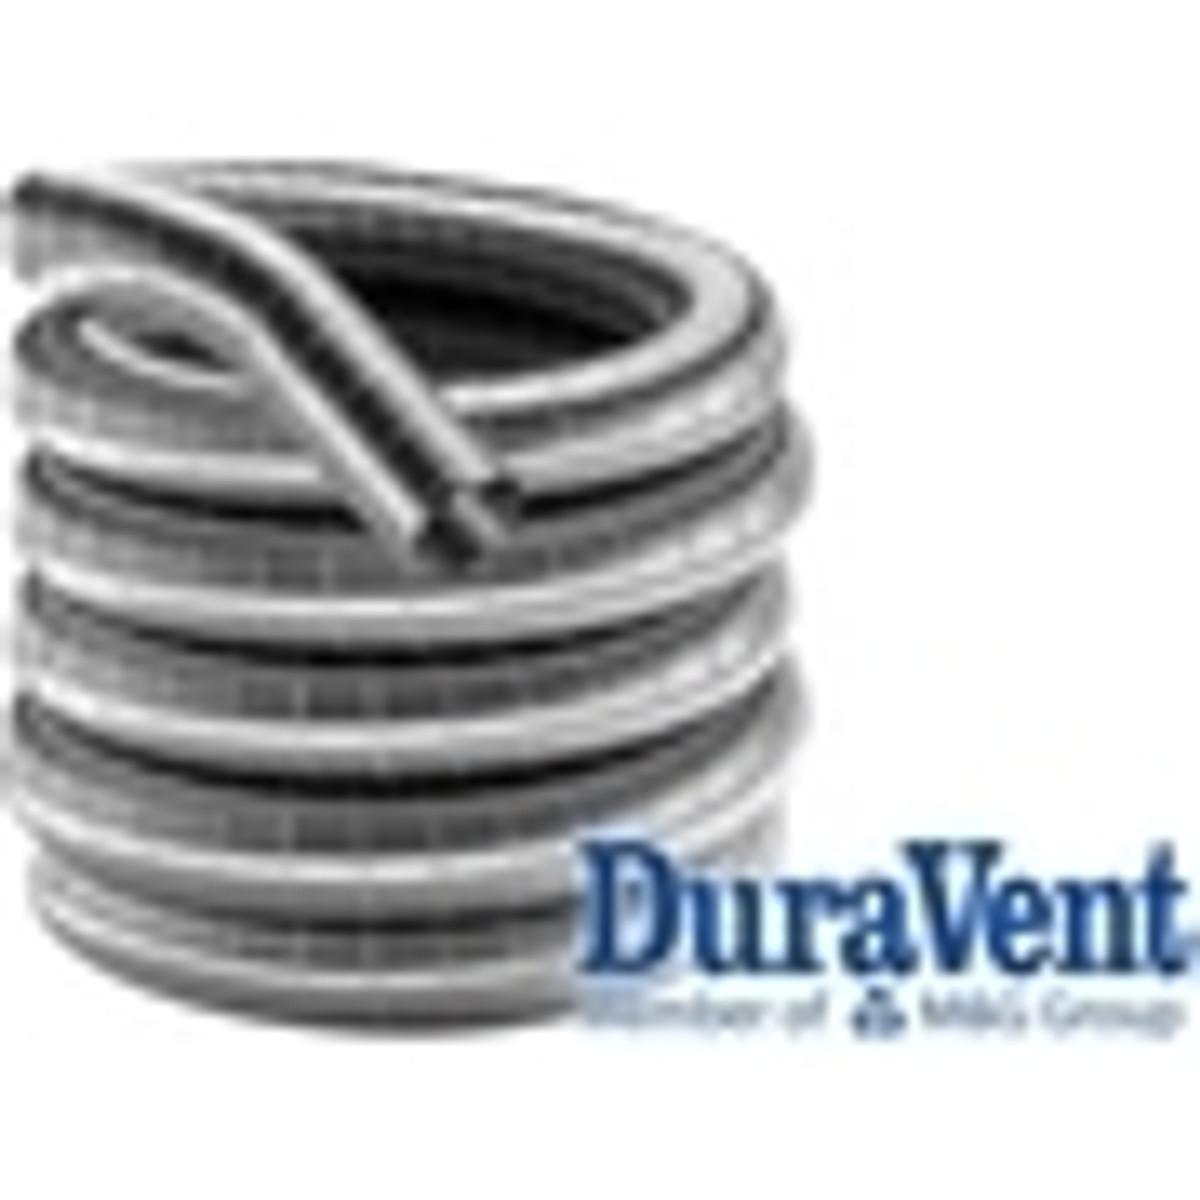 7'' DuraFlex Aluminum Chimney Liner